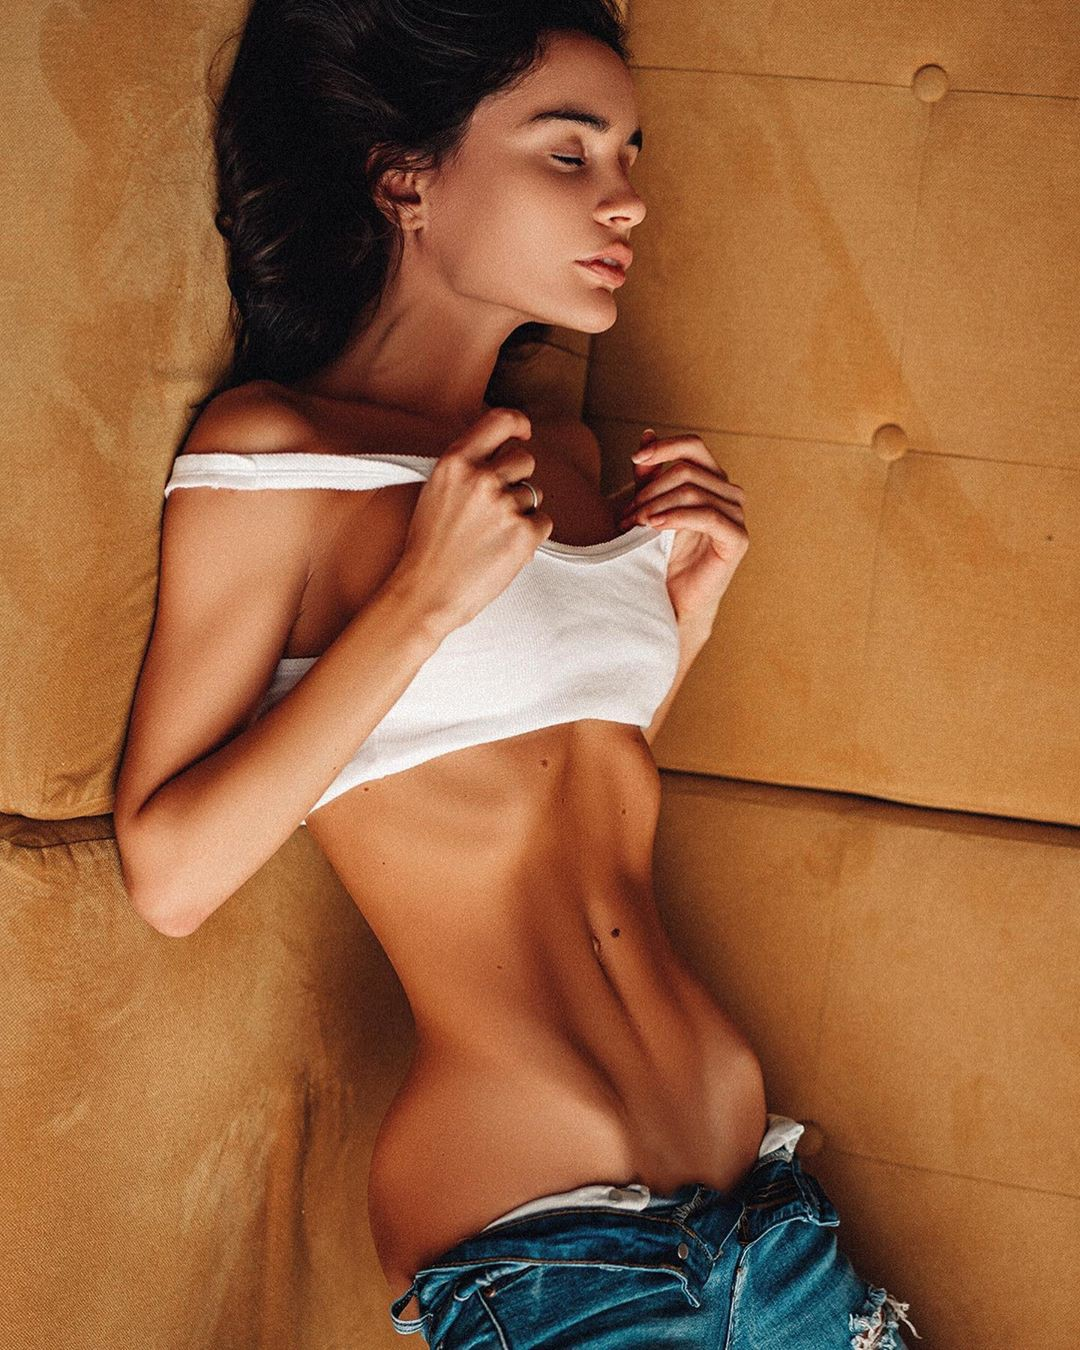 Ekaterina Zueva fine legs, muscle pic, Black Hairstyle Ideas